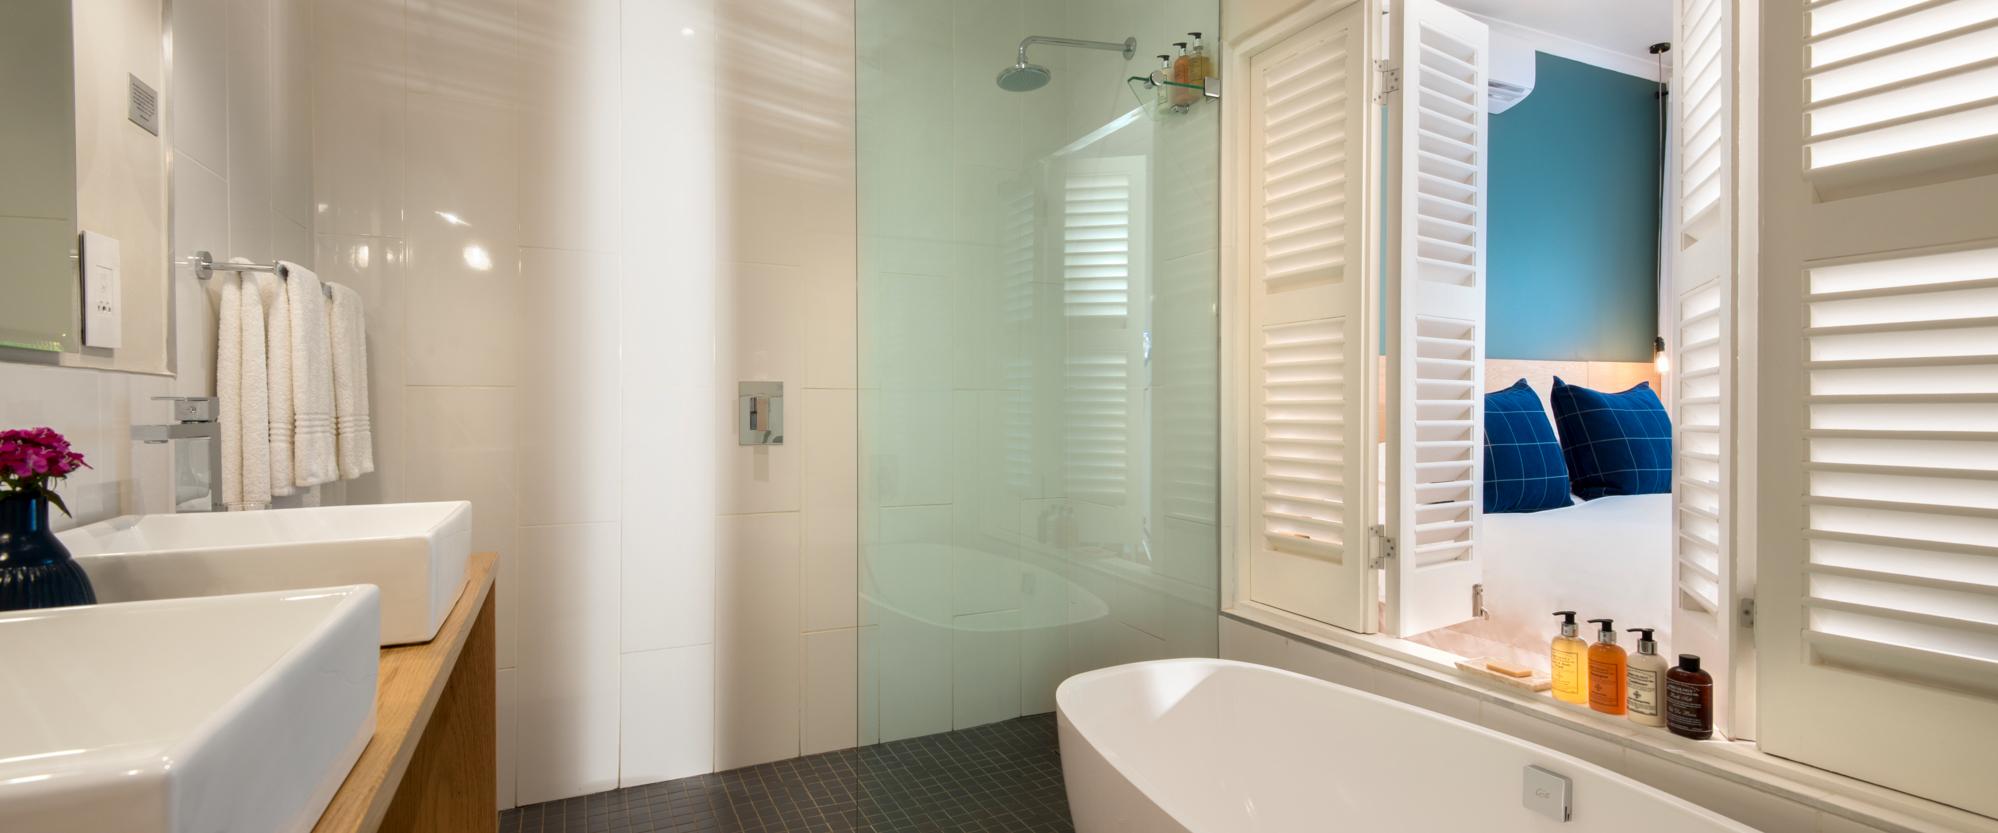 onebedroom-090224